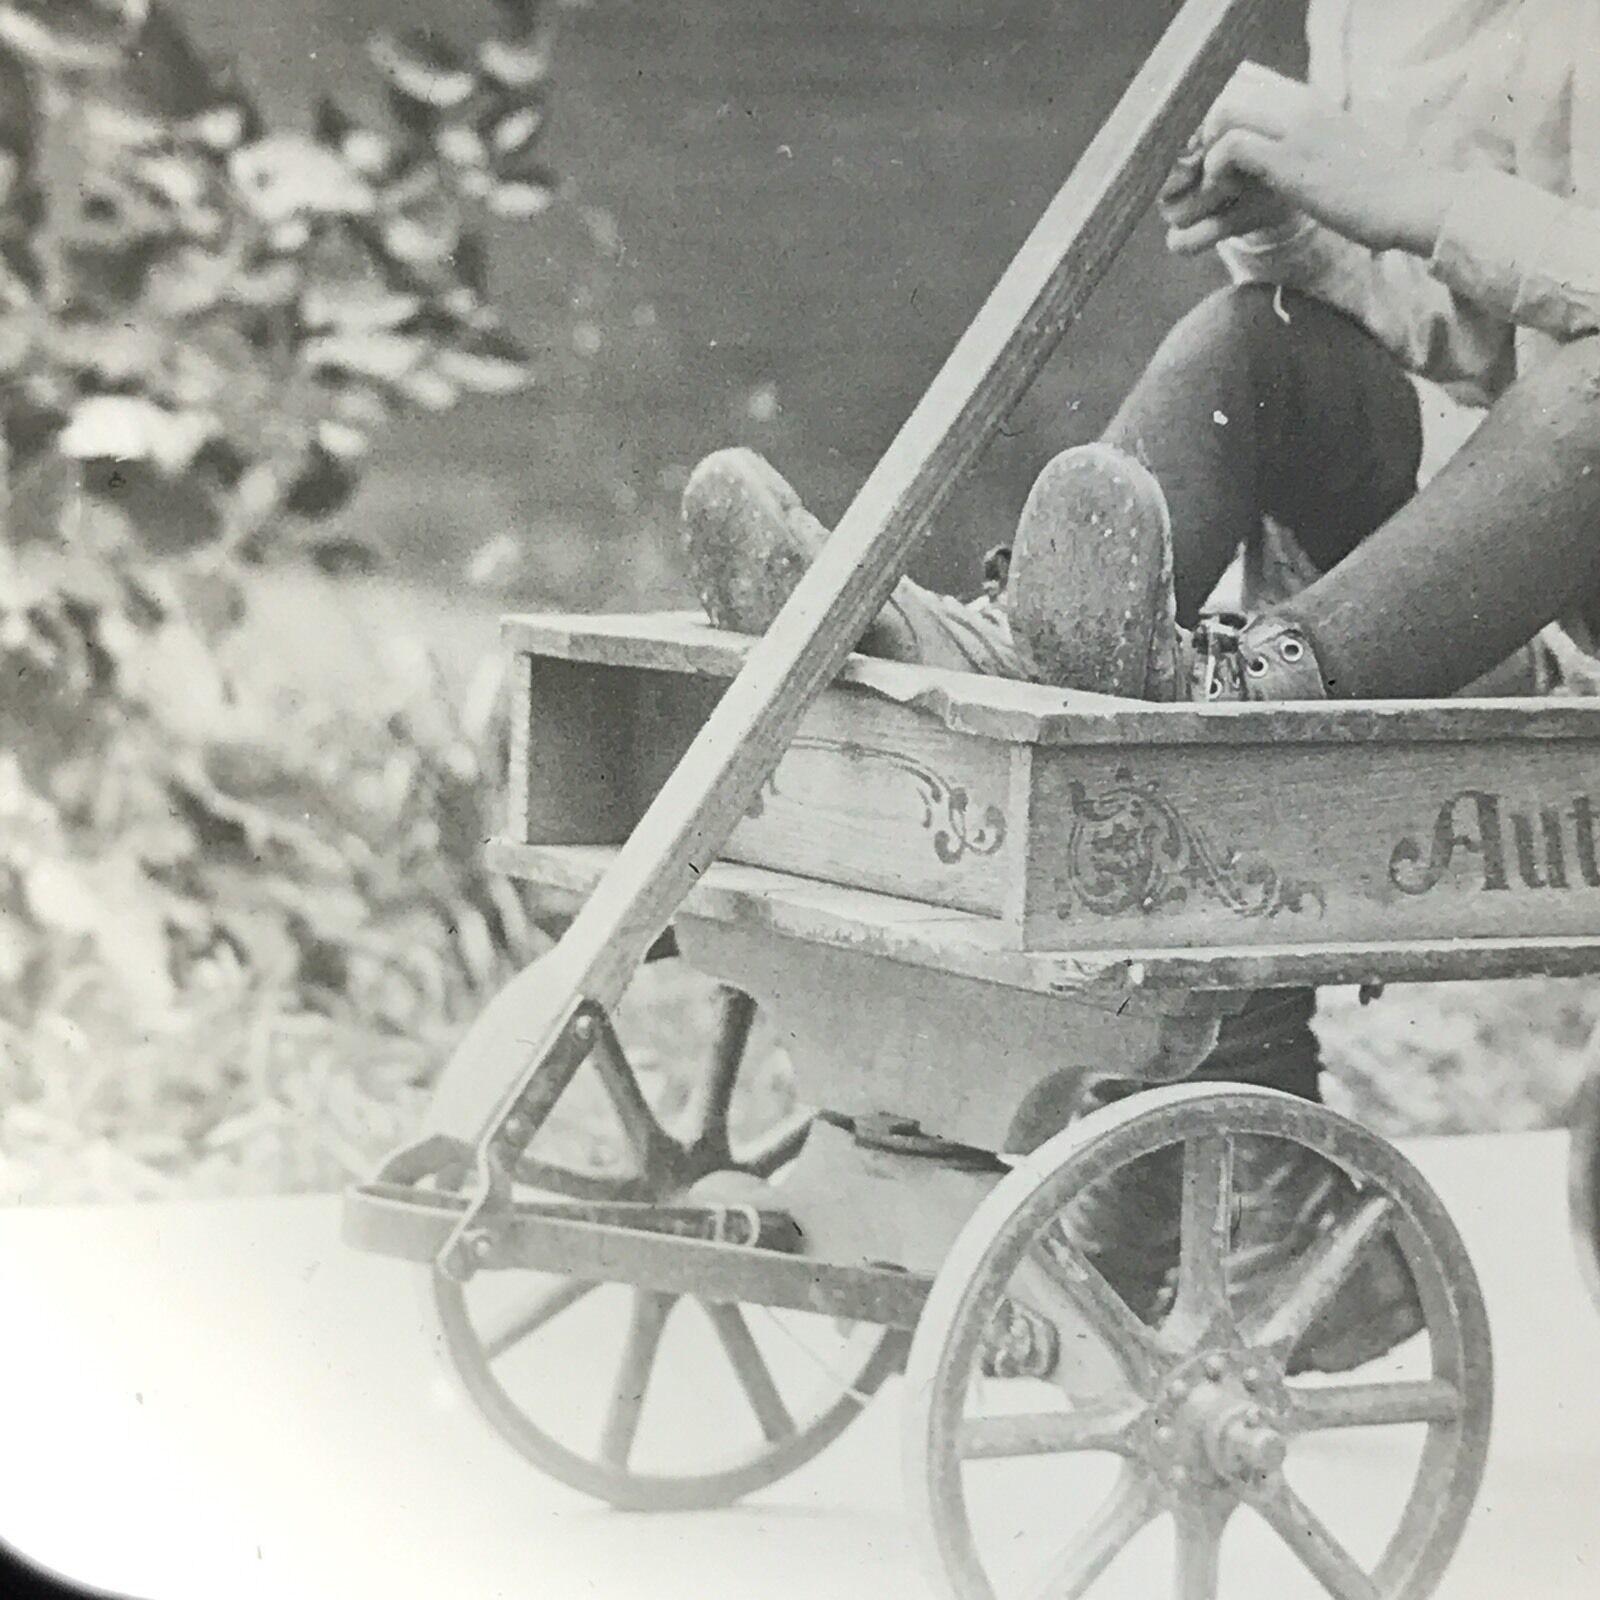 Girls in Auto-Wheel Coaster, magic lantern slide (c.1920) 3.jpg